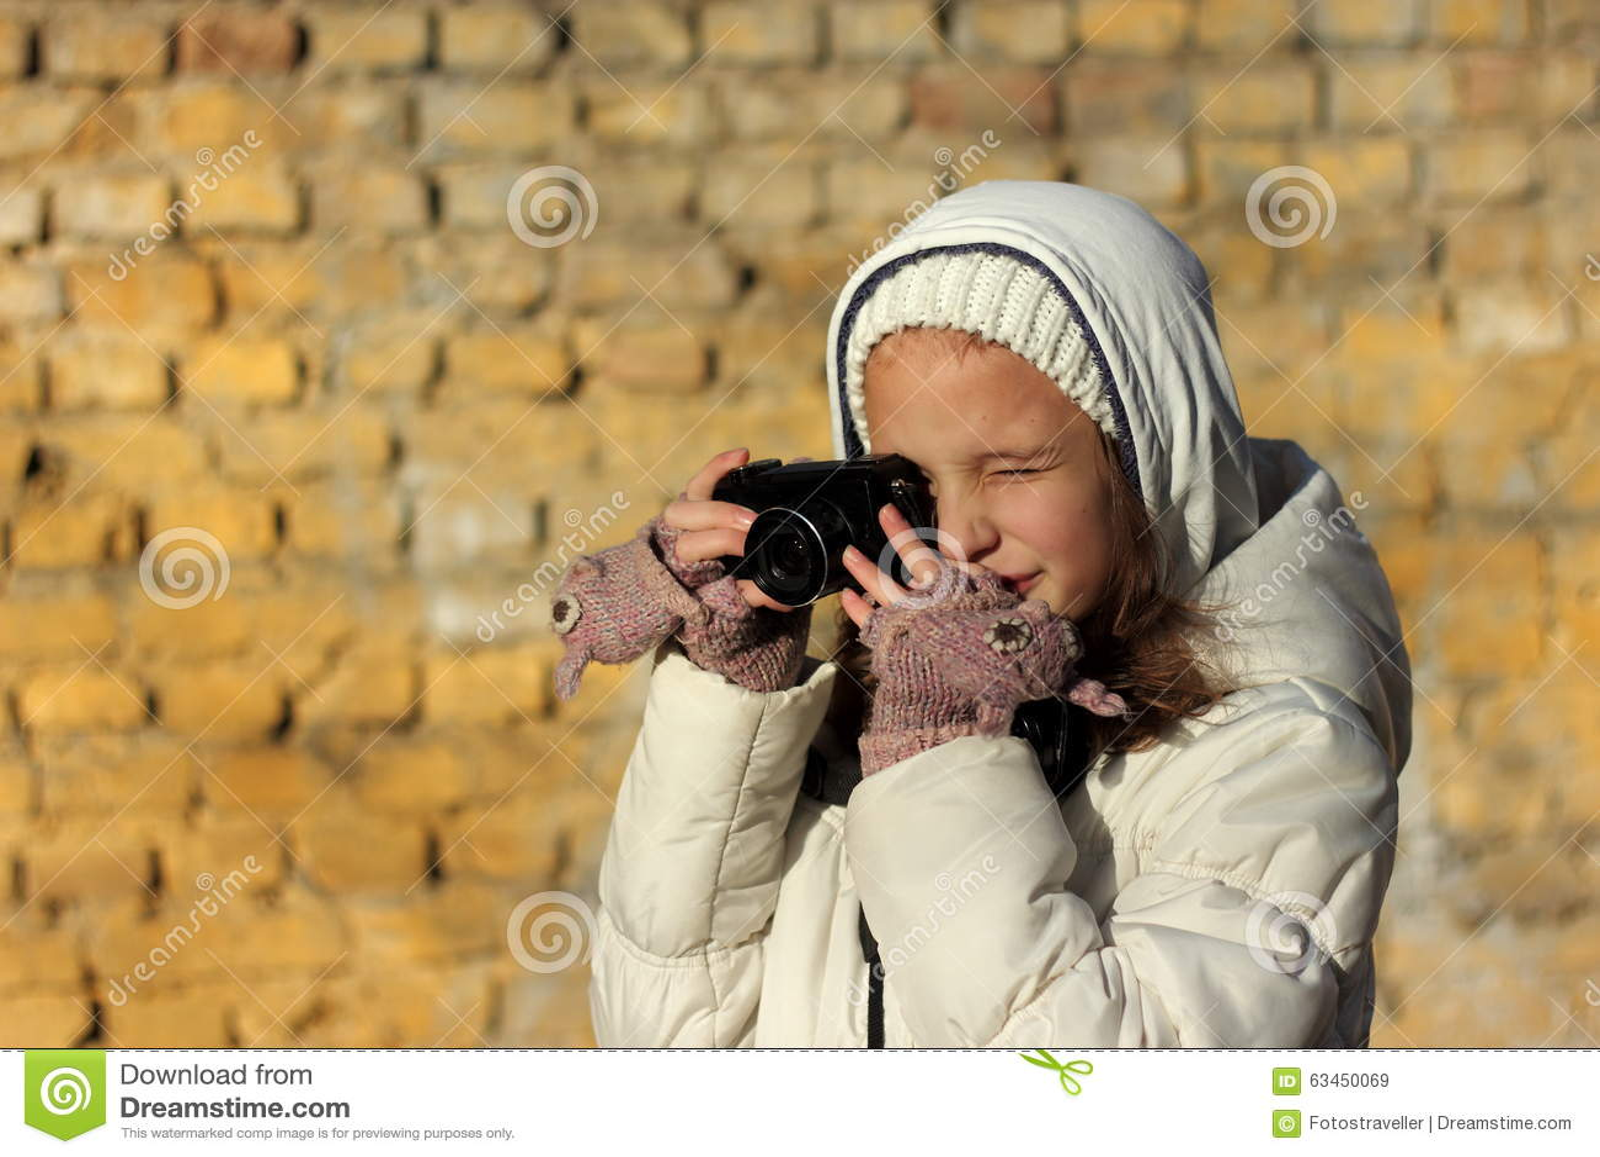 Фотоснимки девушки 1 фотография